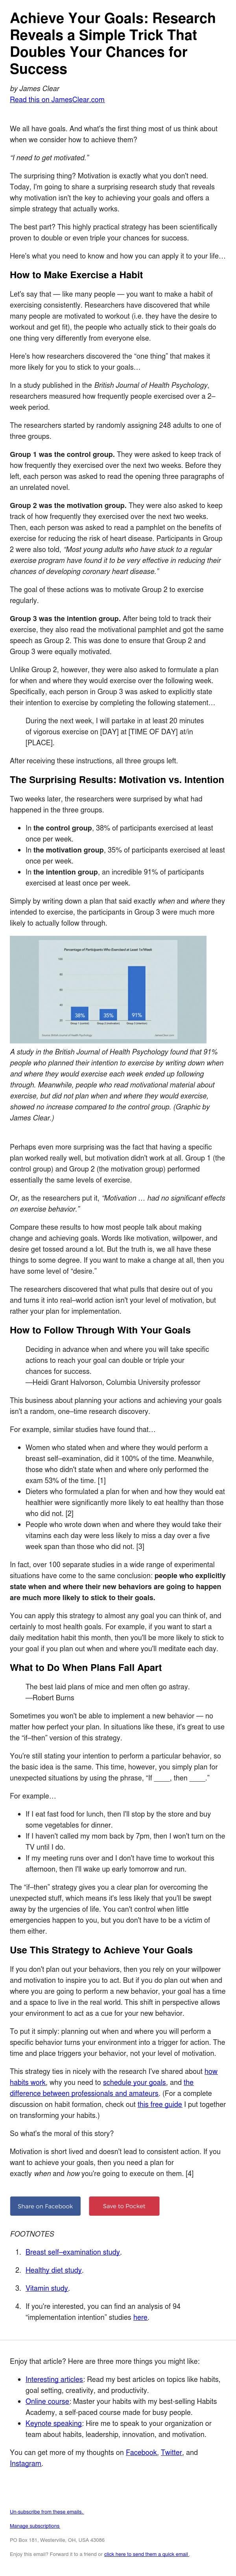 Achieve Your Goals: Research Reveals a Simple Trick That Doubles Your Chances for Success